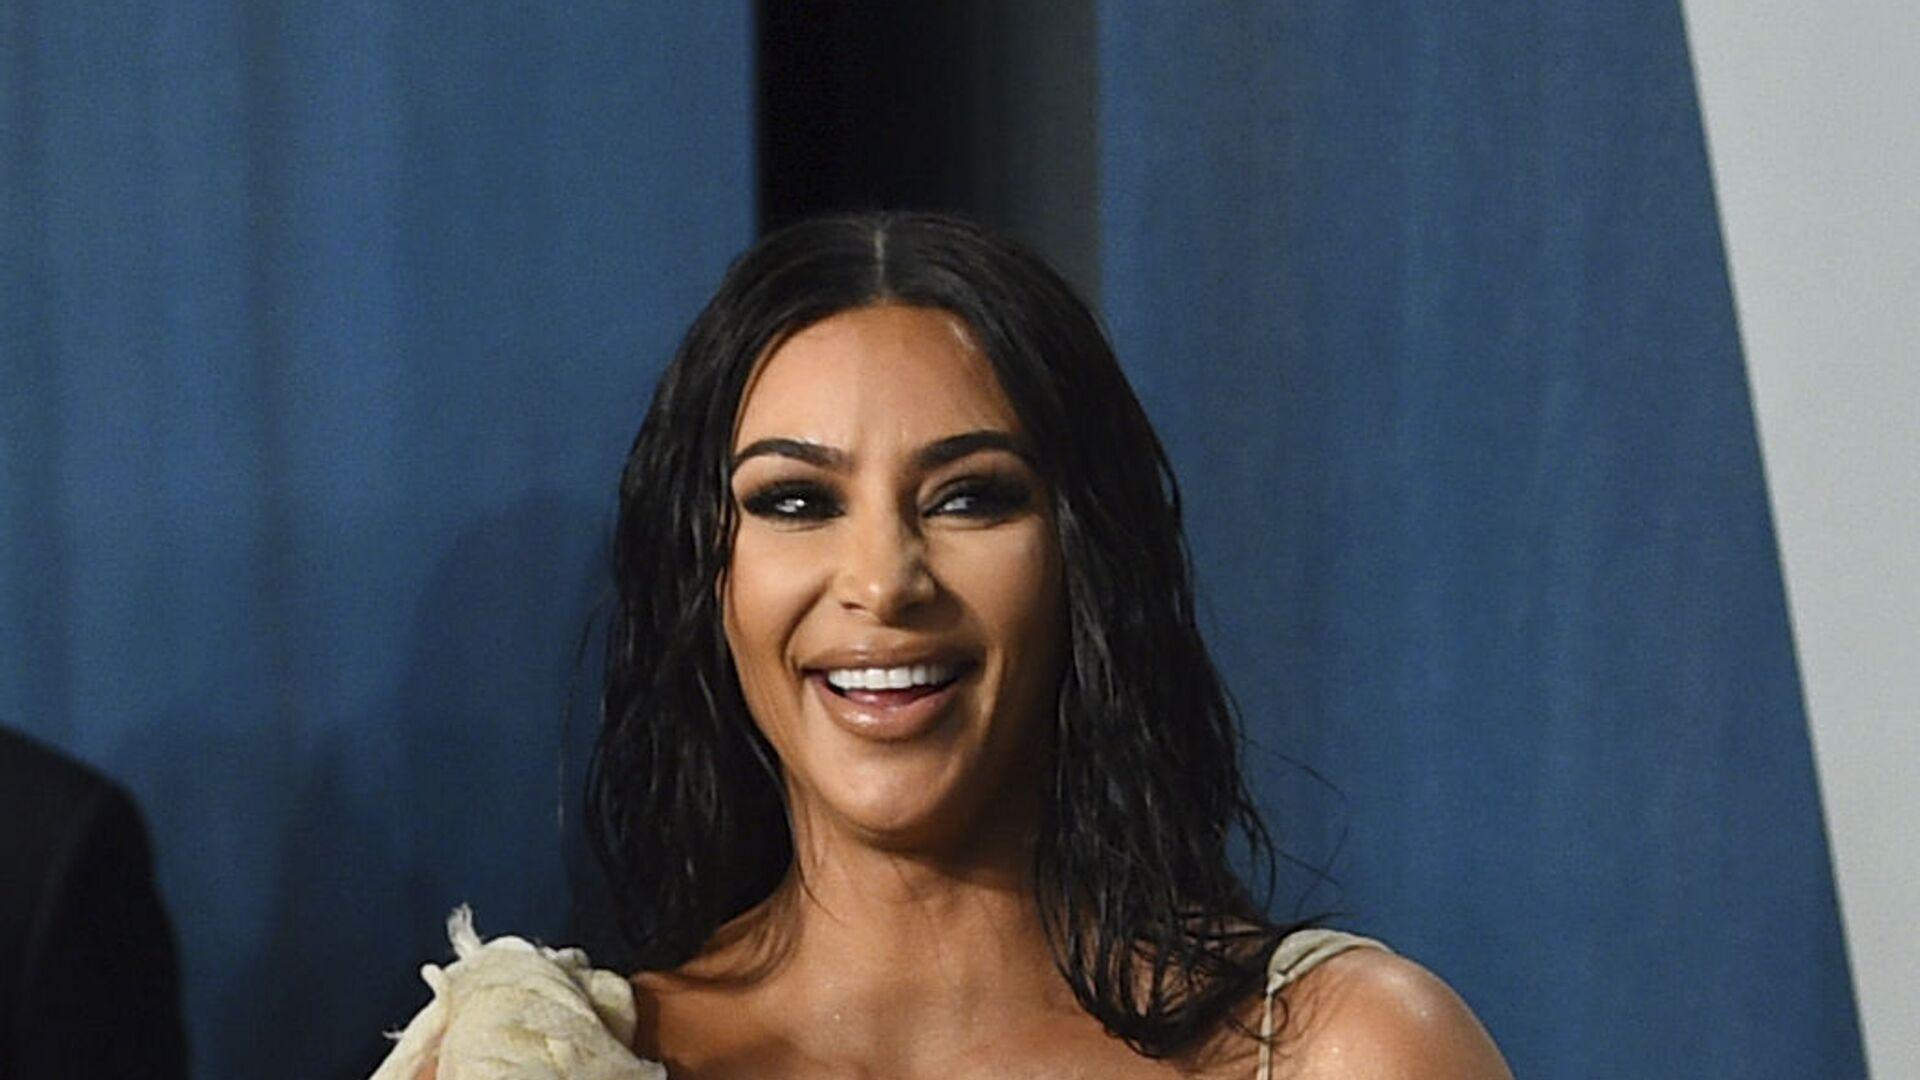 Kim Kardashian arrives at the Vanity Fair Oscar Party on Sunday, Feb. 9, 2020, in Beverly Hills, Calif - Sputnik International, 1920, 18.09.2021